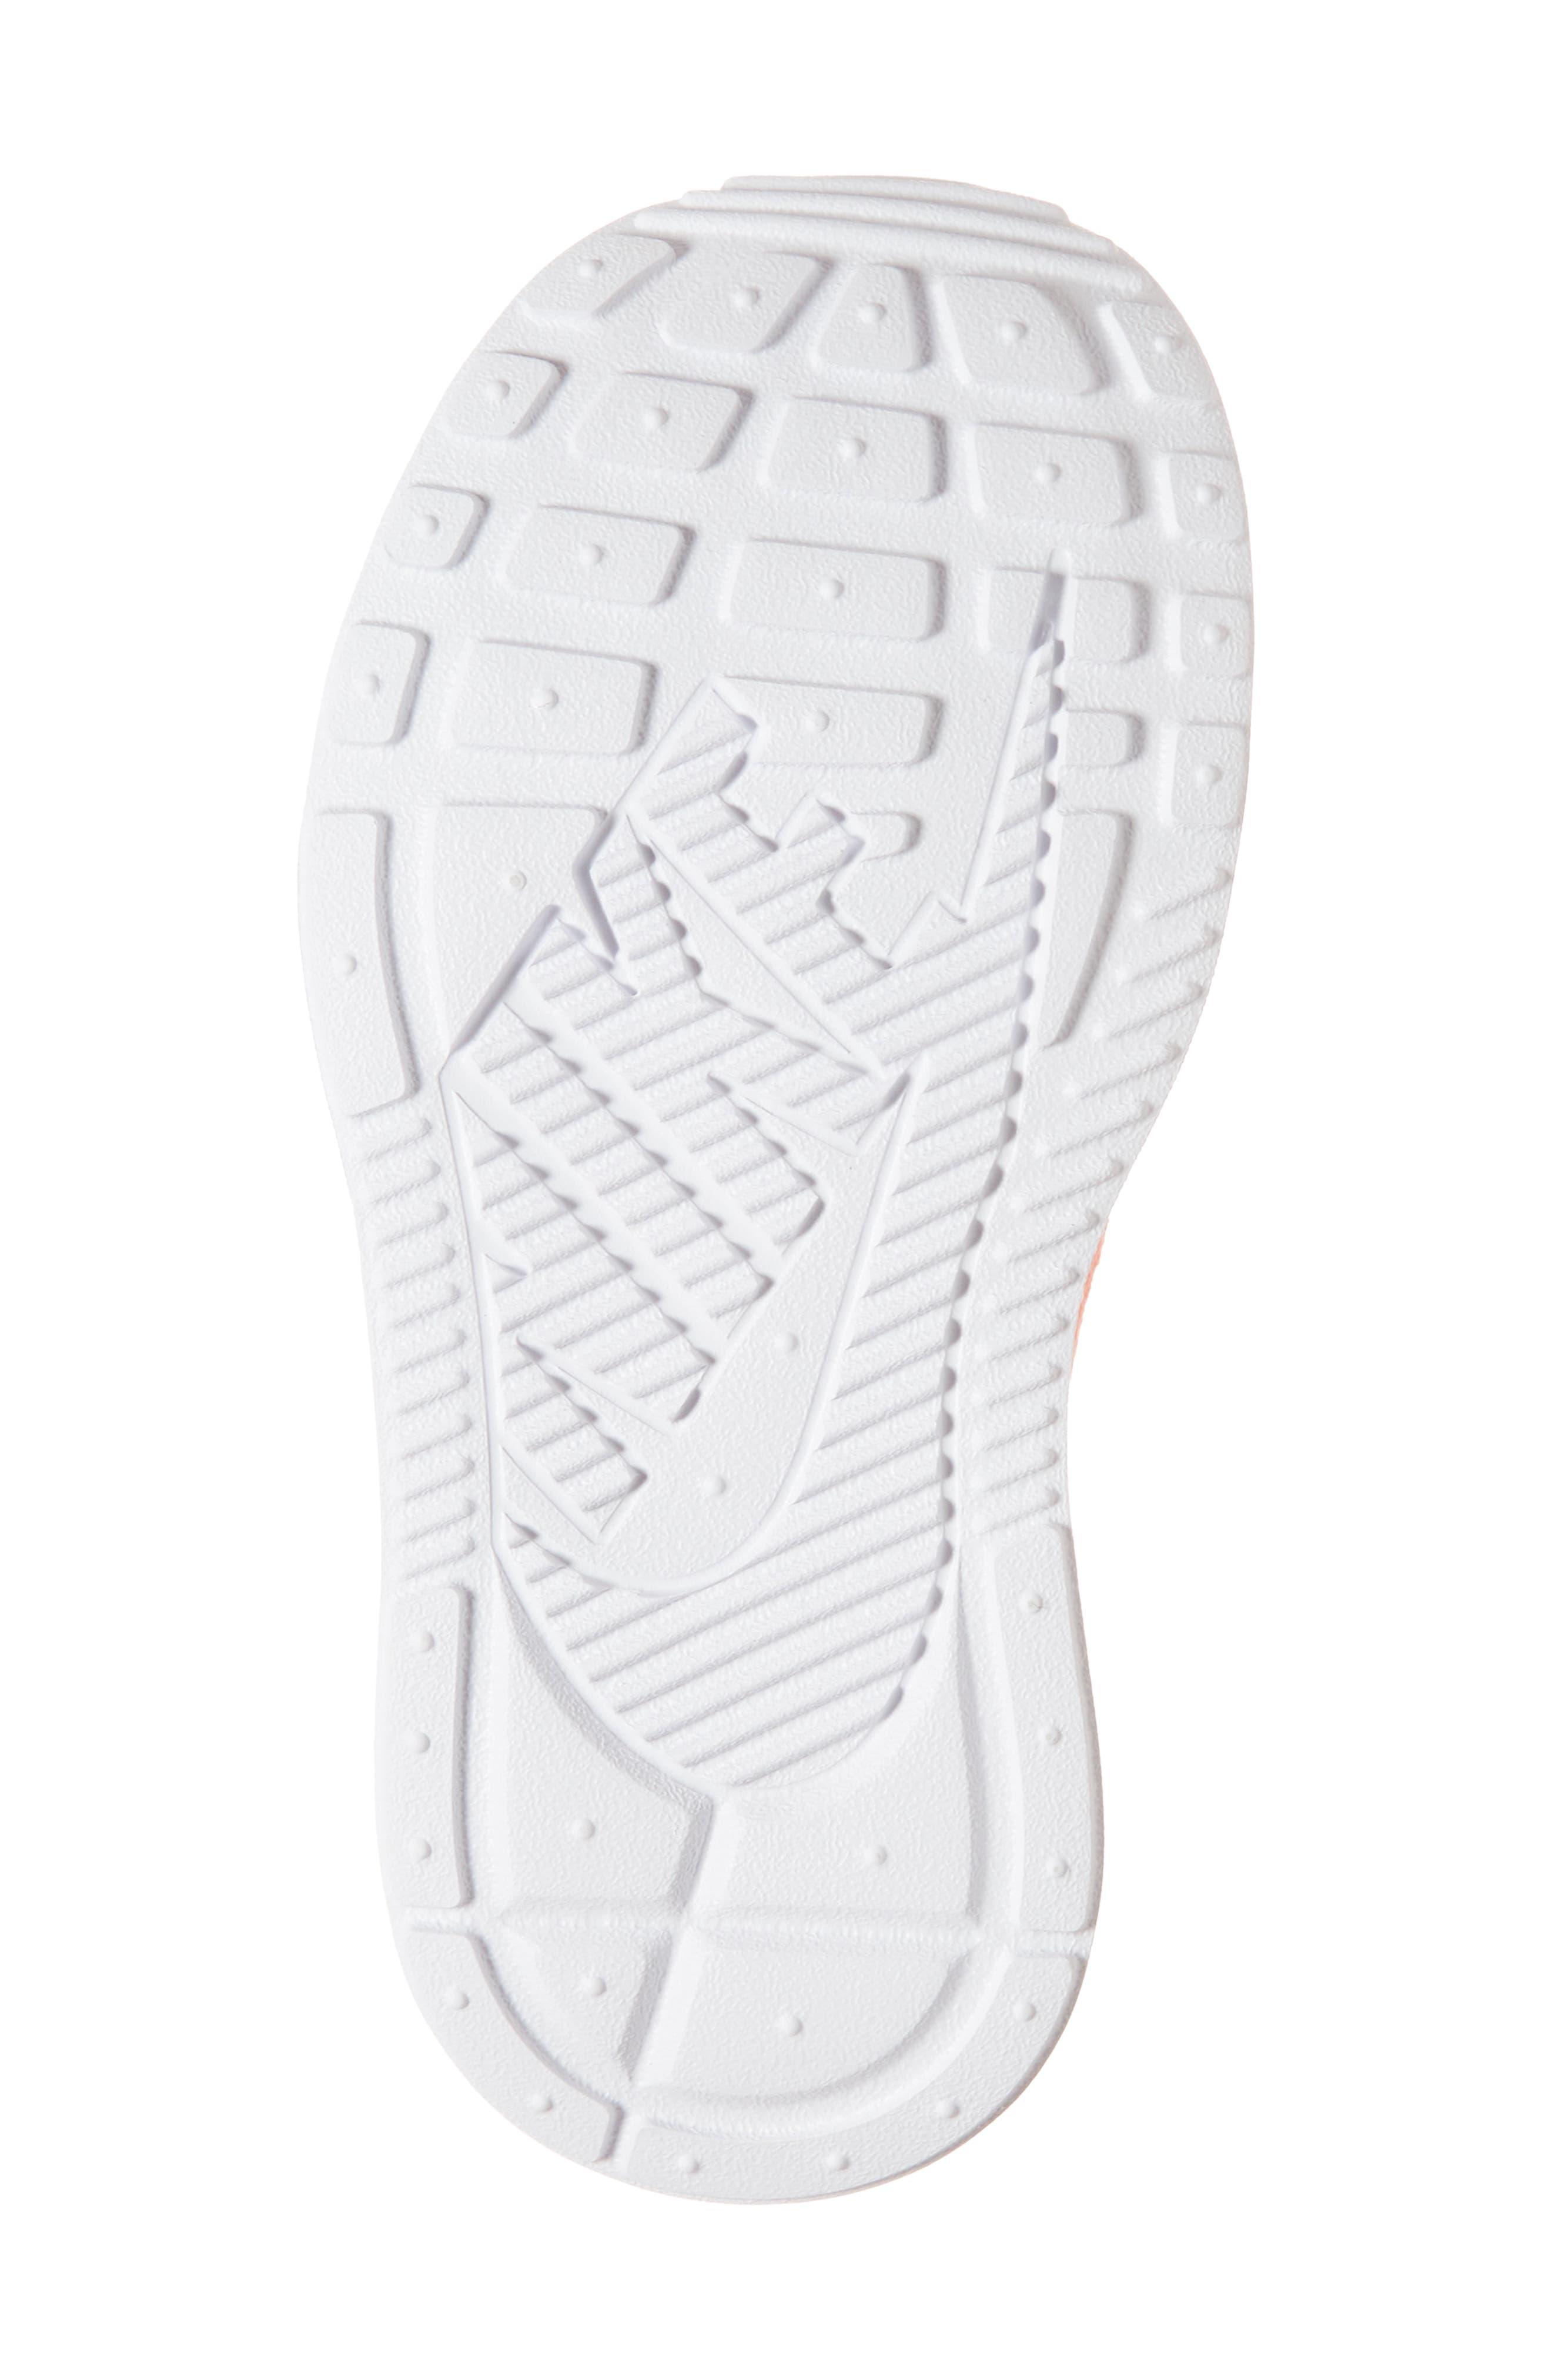 Ashin Modern Sock Knit Sneaker,                             Alternate thumbnail 6, color,                             Atomic Pink/ Metallic Silver